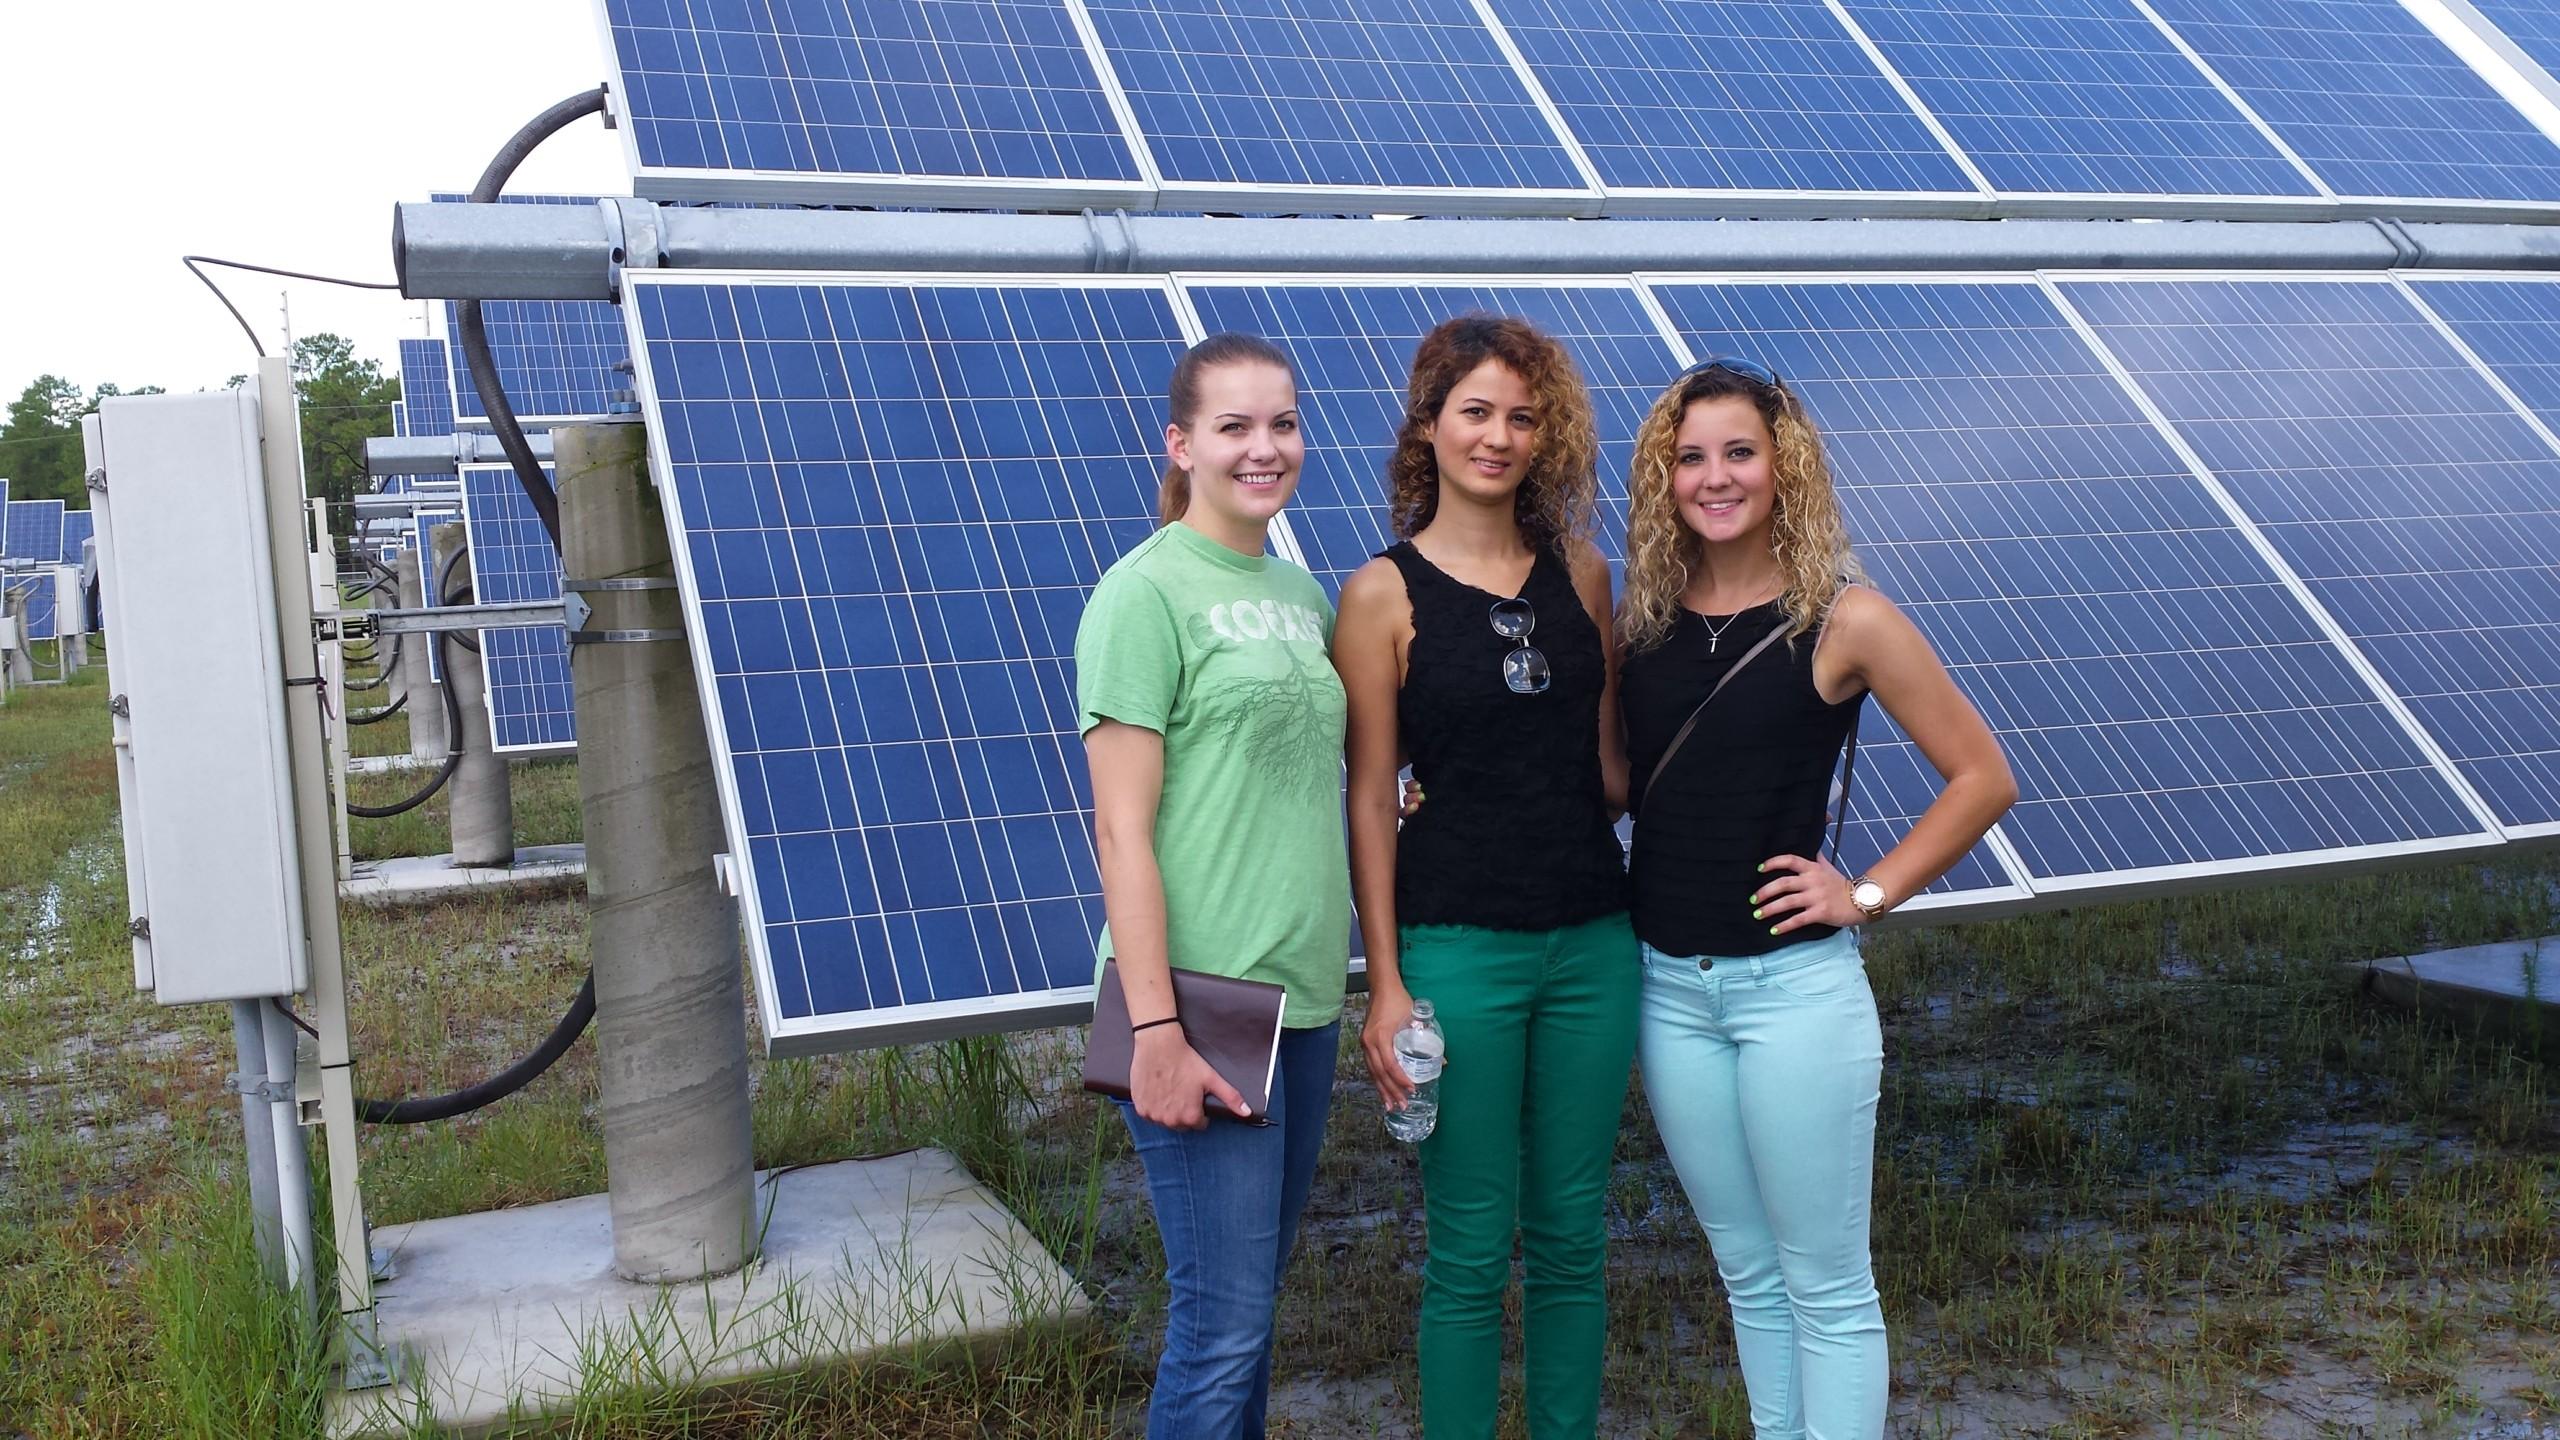 FEEDER summer institute students l to r: Katheryn McCabe, Sanaz Paran, Brittany Richard